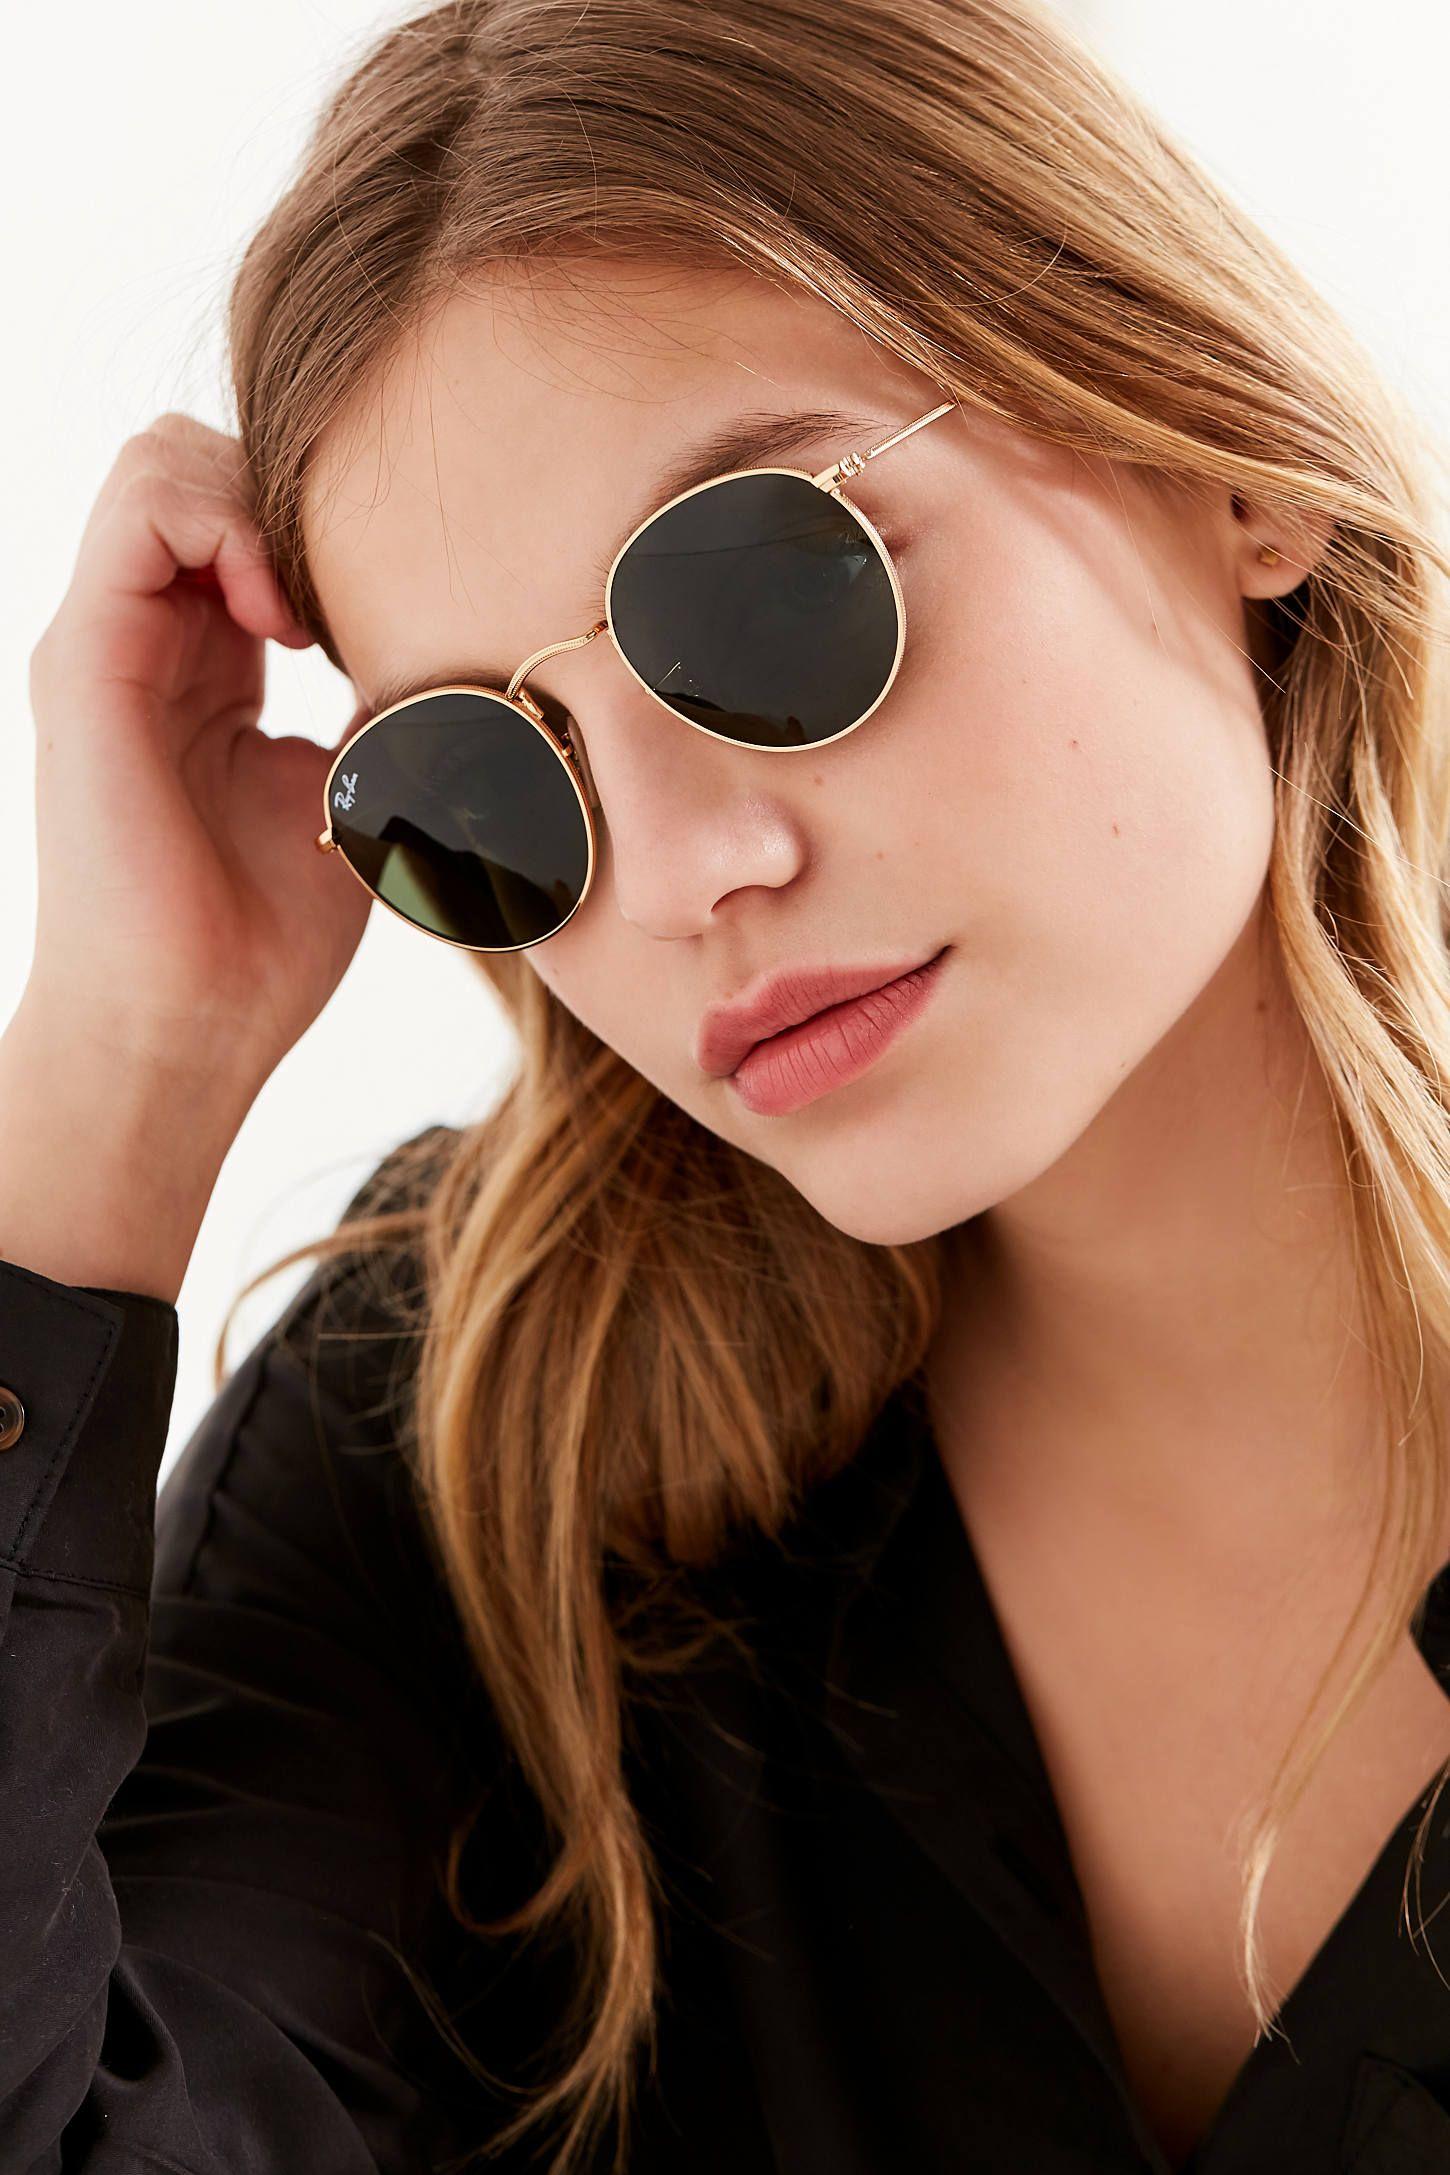 Ray Ban Round Metal Classic Sunglasses Ray Ban Sunglasses Women Classic Sunglasses Metal Sunglasses